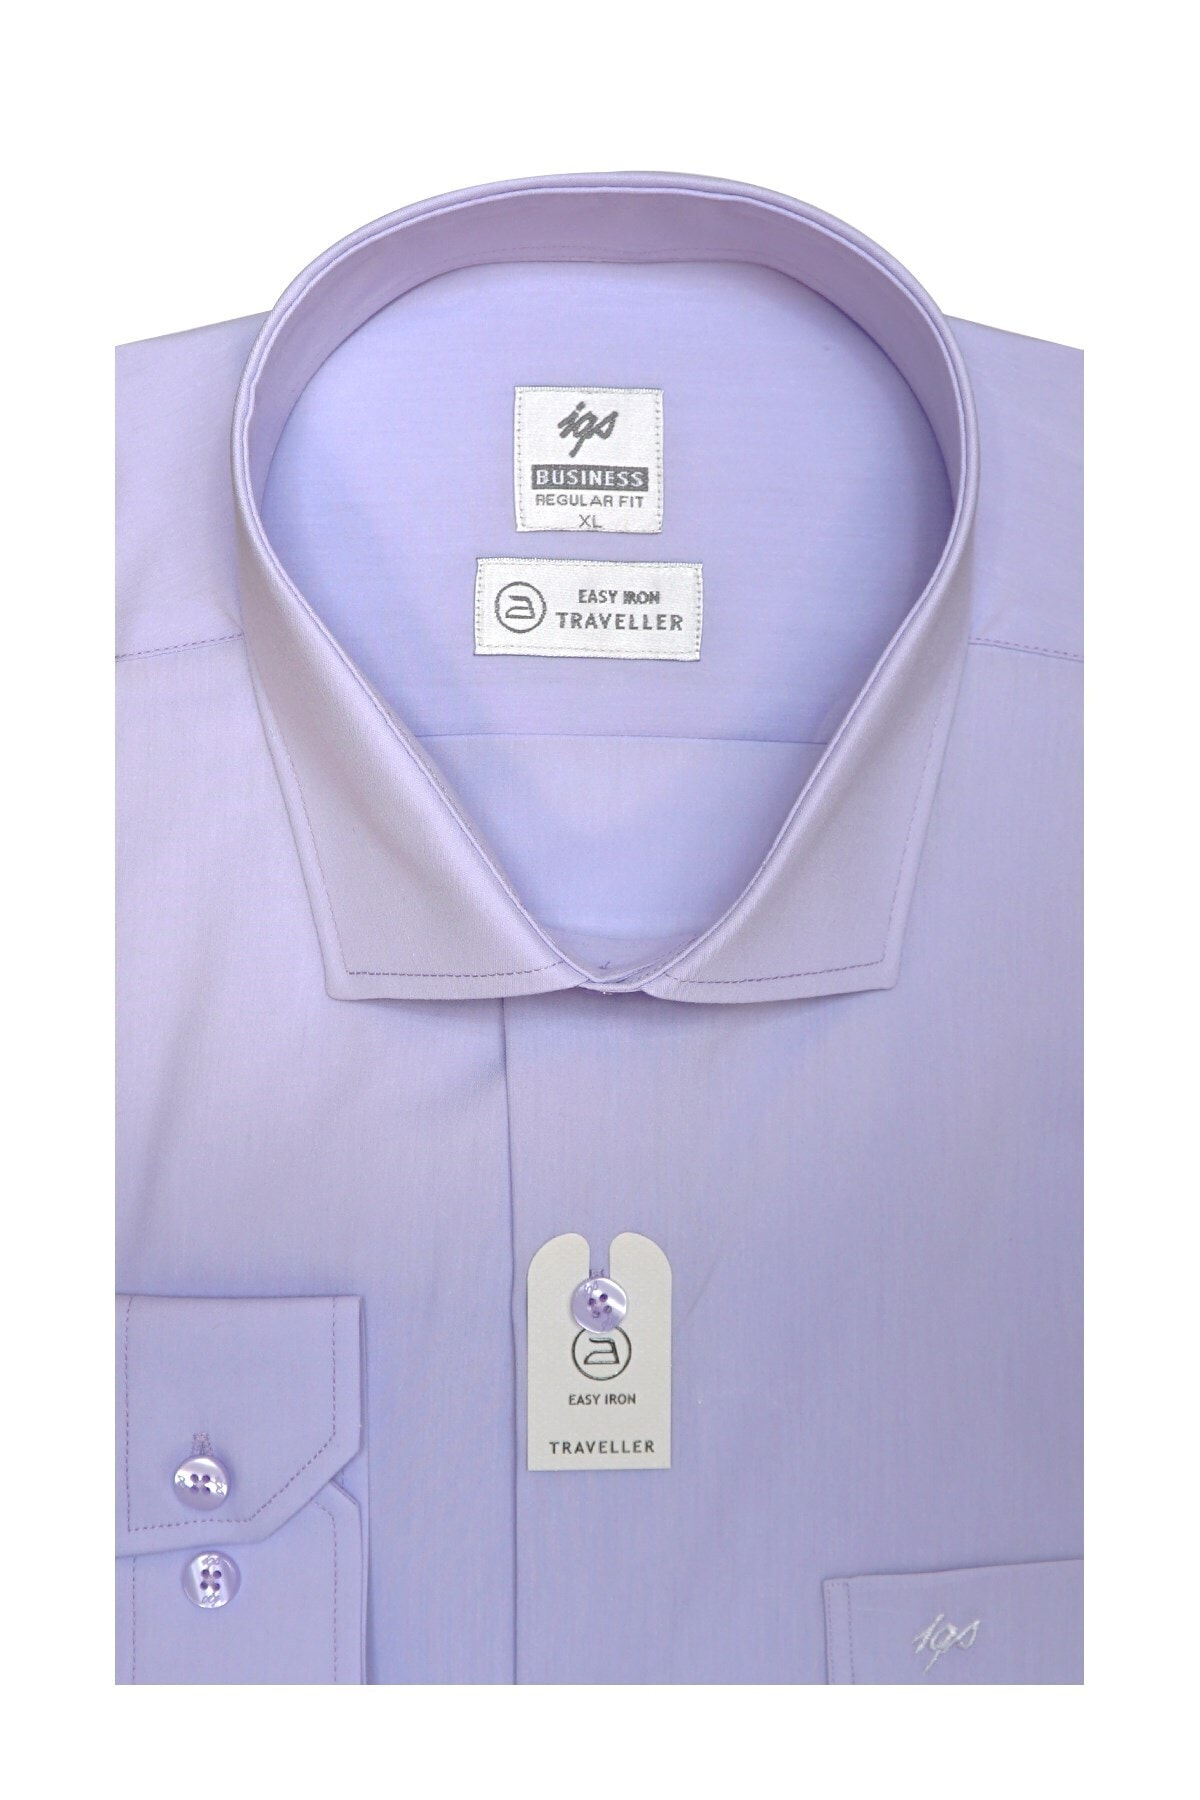 İgs Erkek Lila Regularfıt / Rahat Kalıp 7 Cm Klasik Gömlek 2